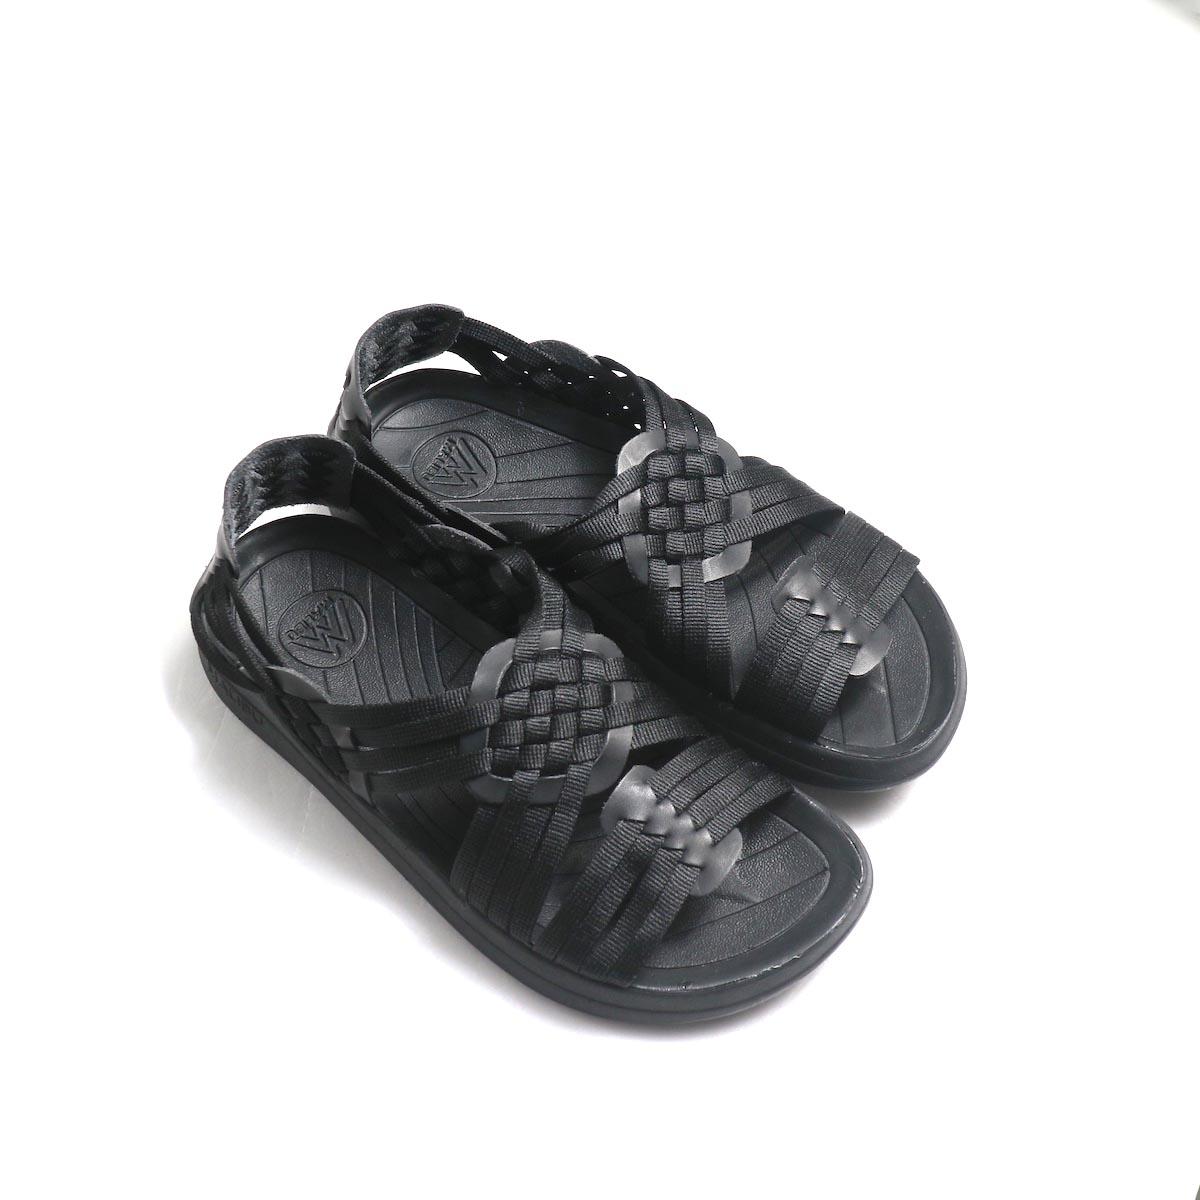 Malibu Sandals / Canyon (Nylon Weave) -Black ナナメ